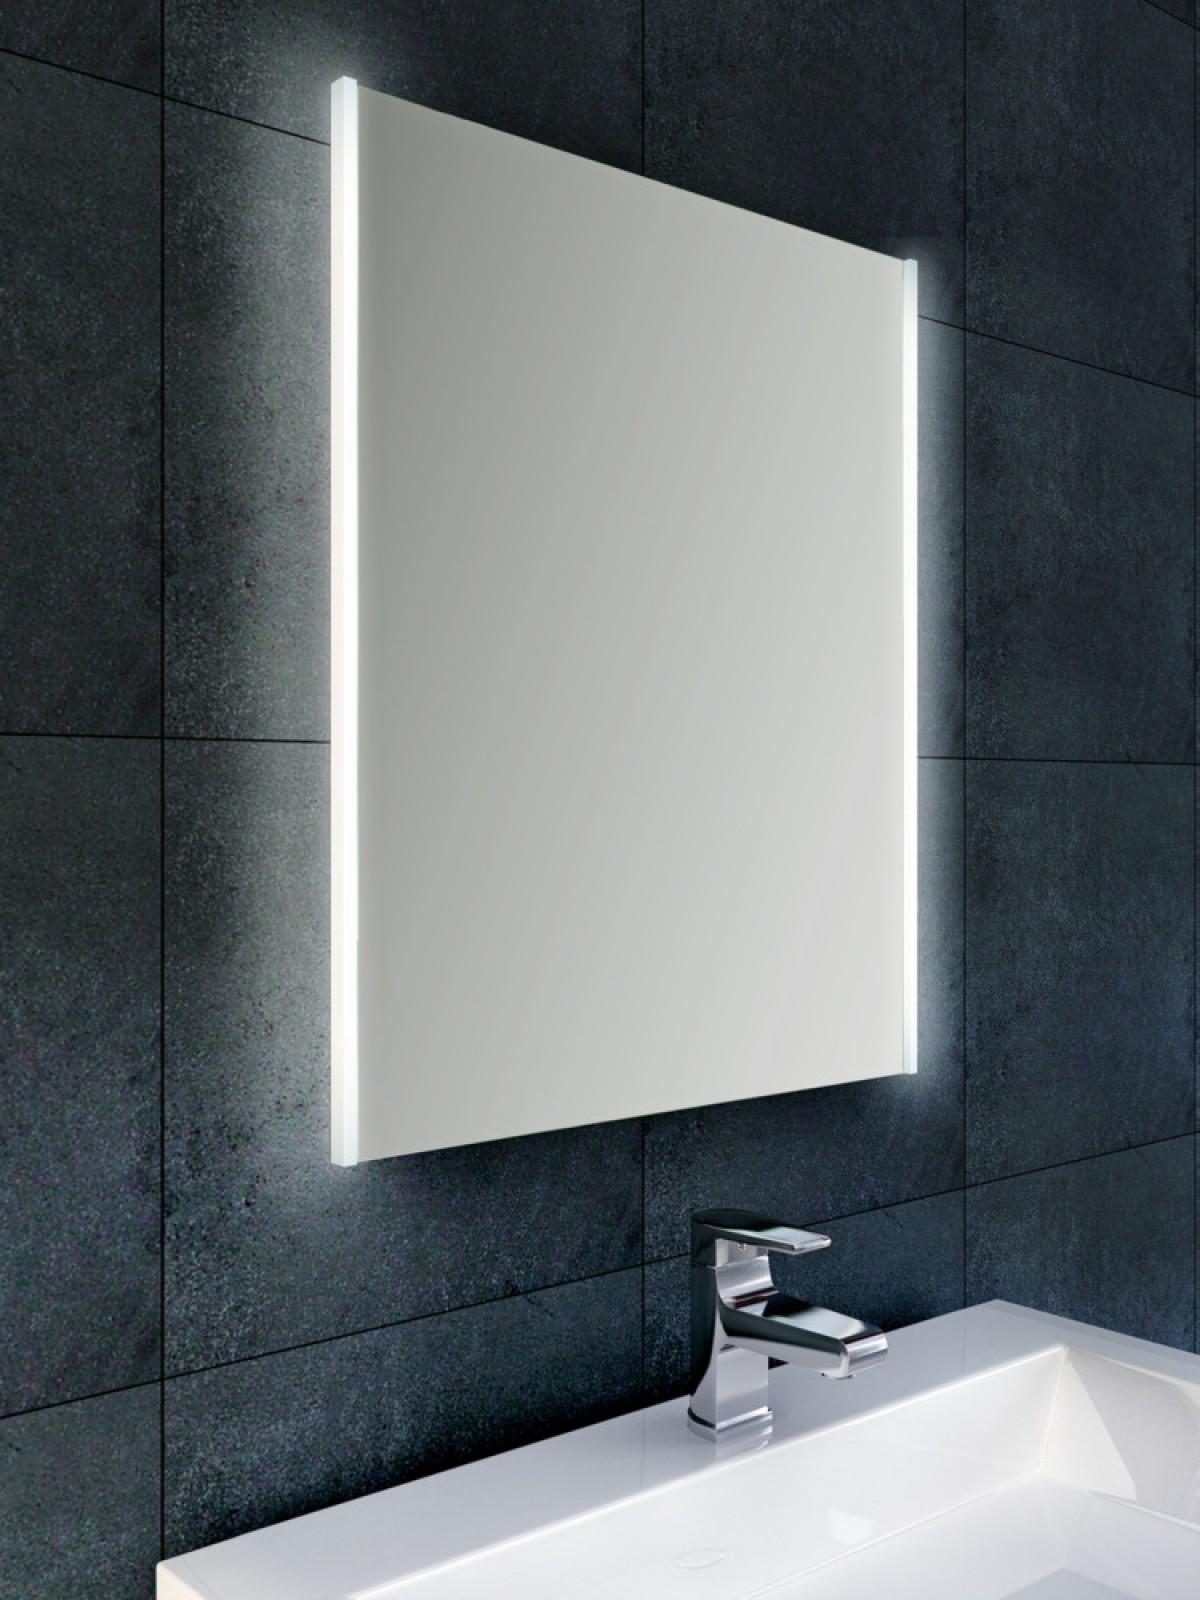 Spiegelverwarming in de badkamer | Blog Sanifun